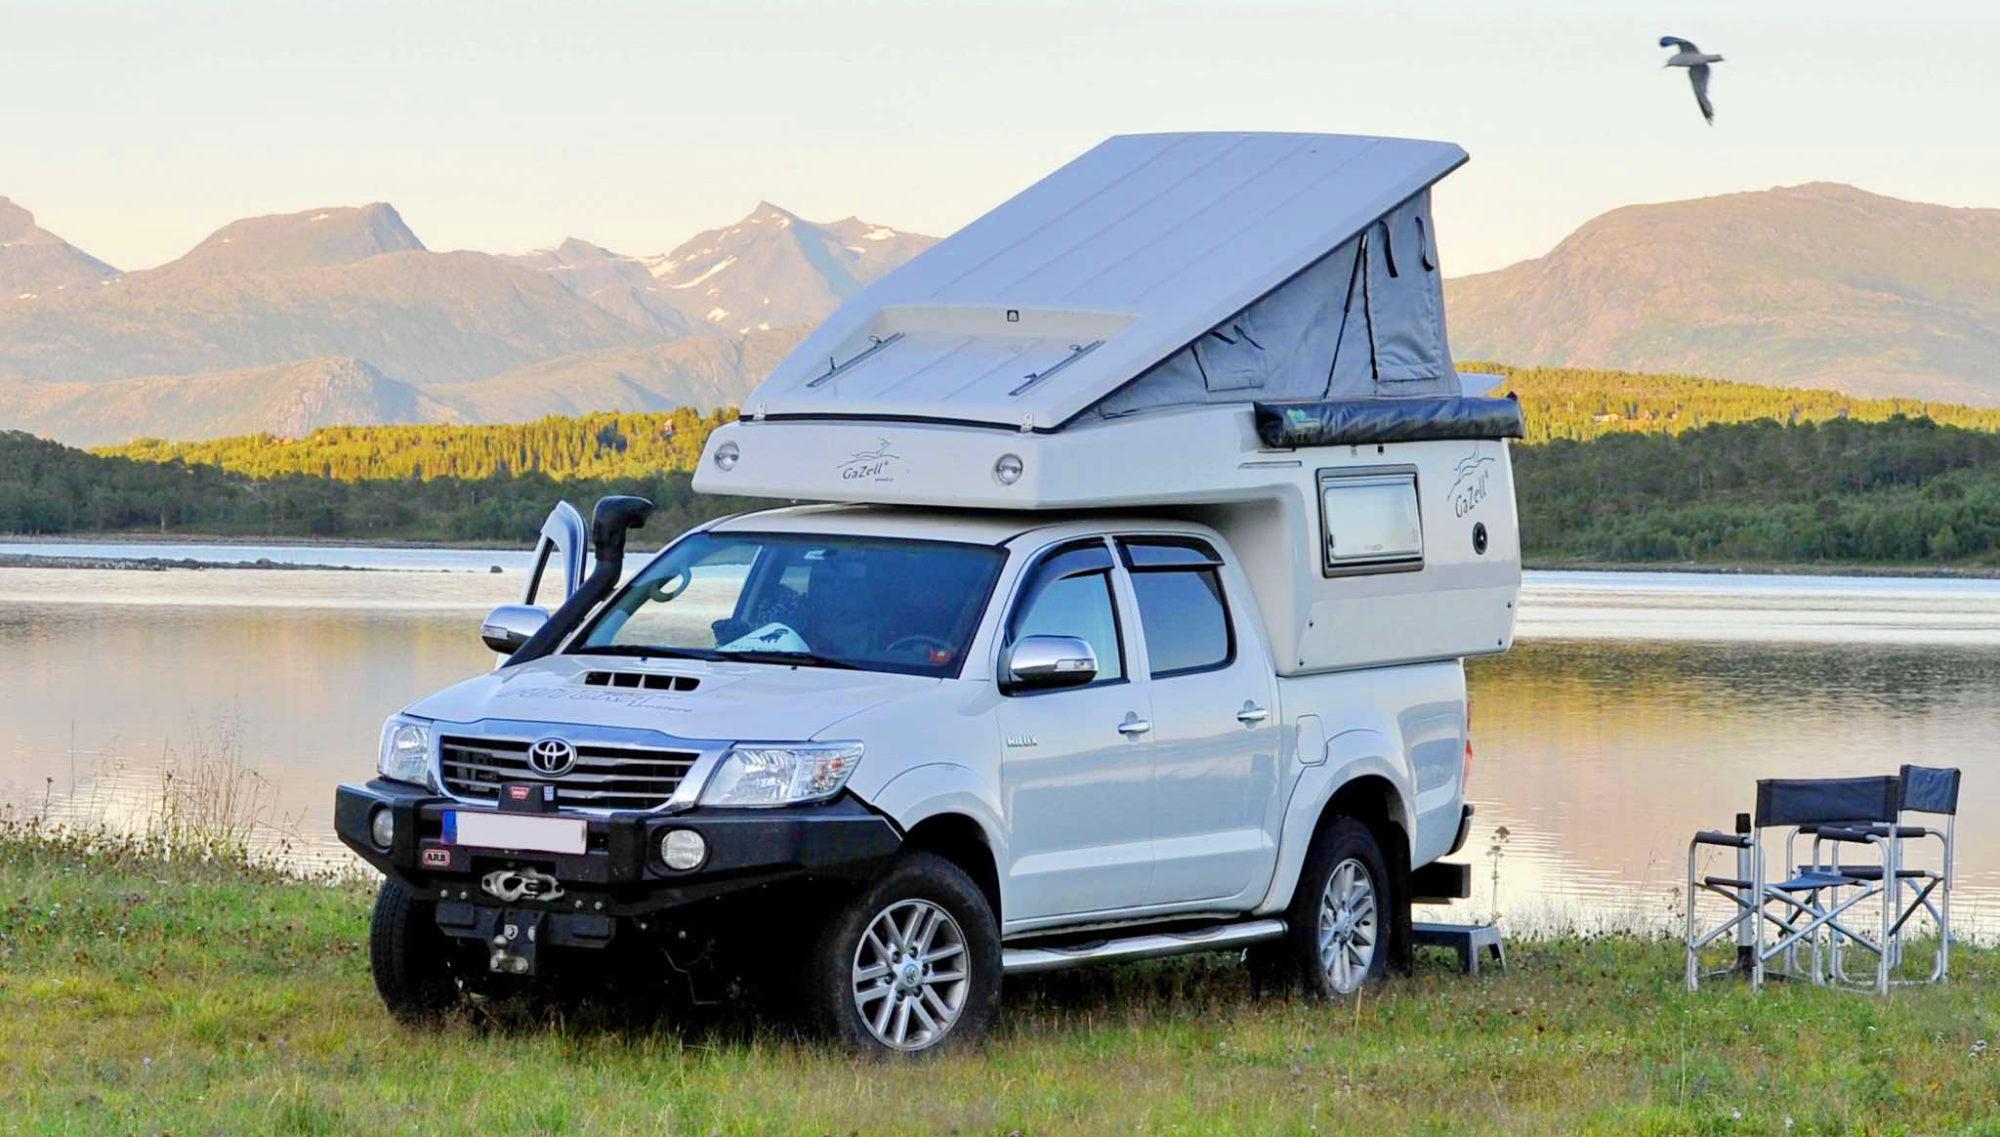 Gazell Camper